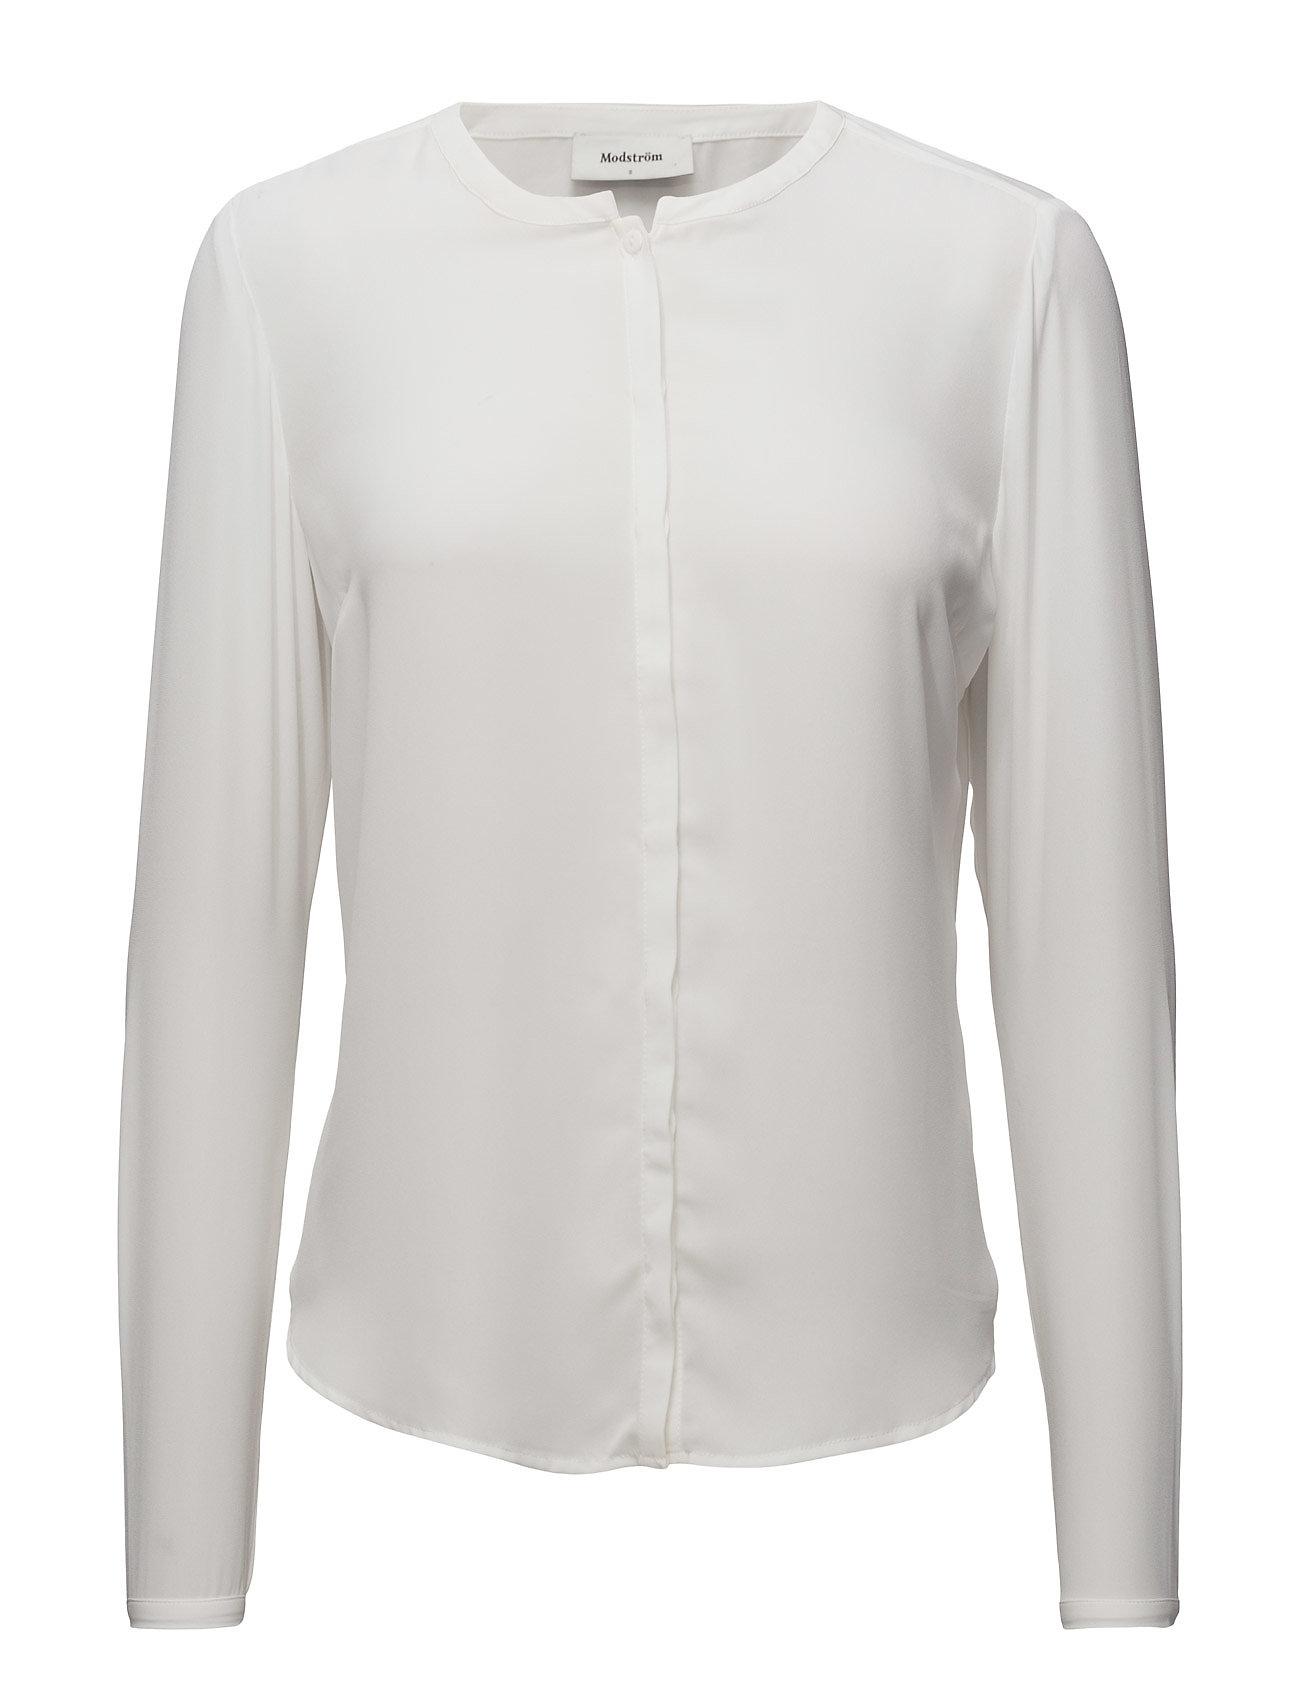 Modström Cyler shirt - PORCELAIN